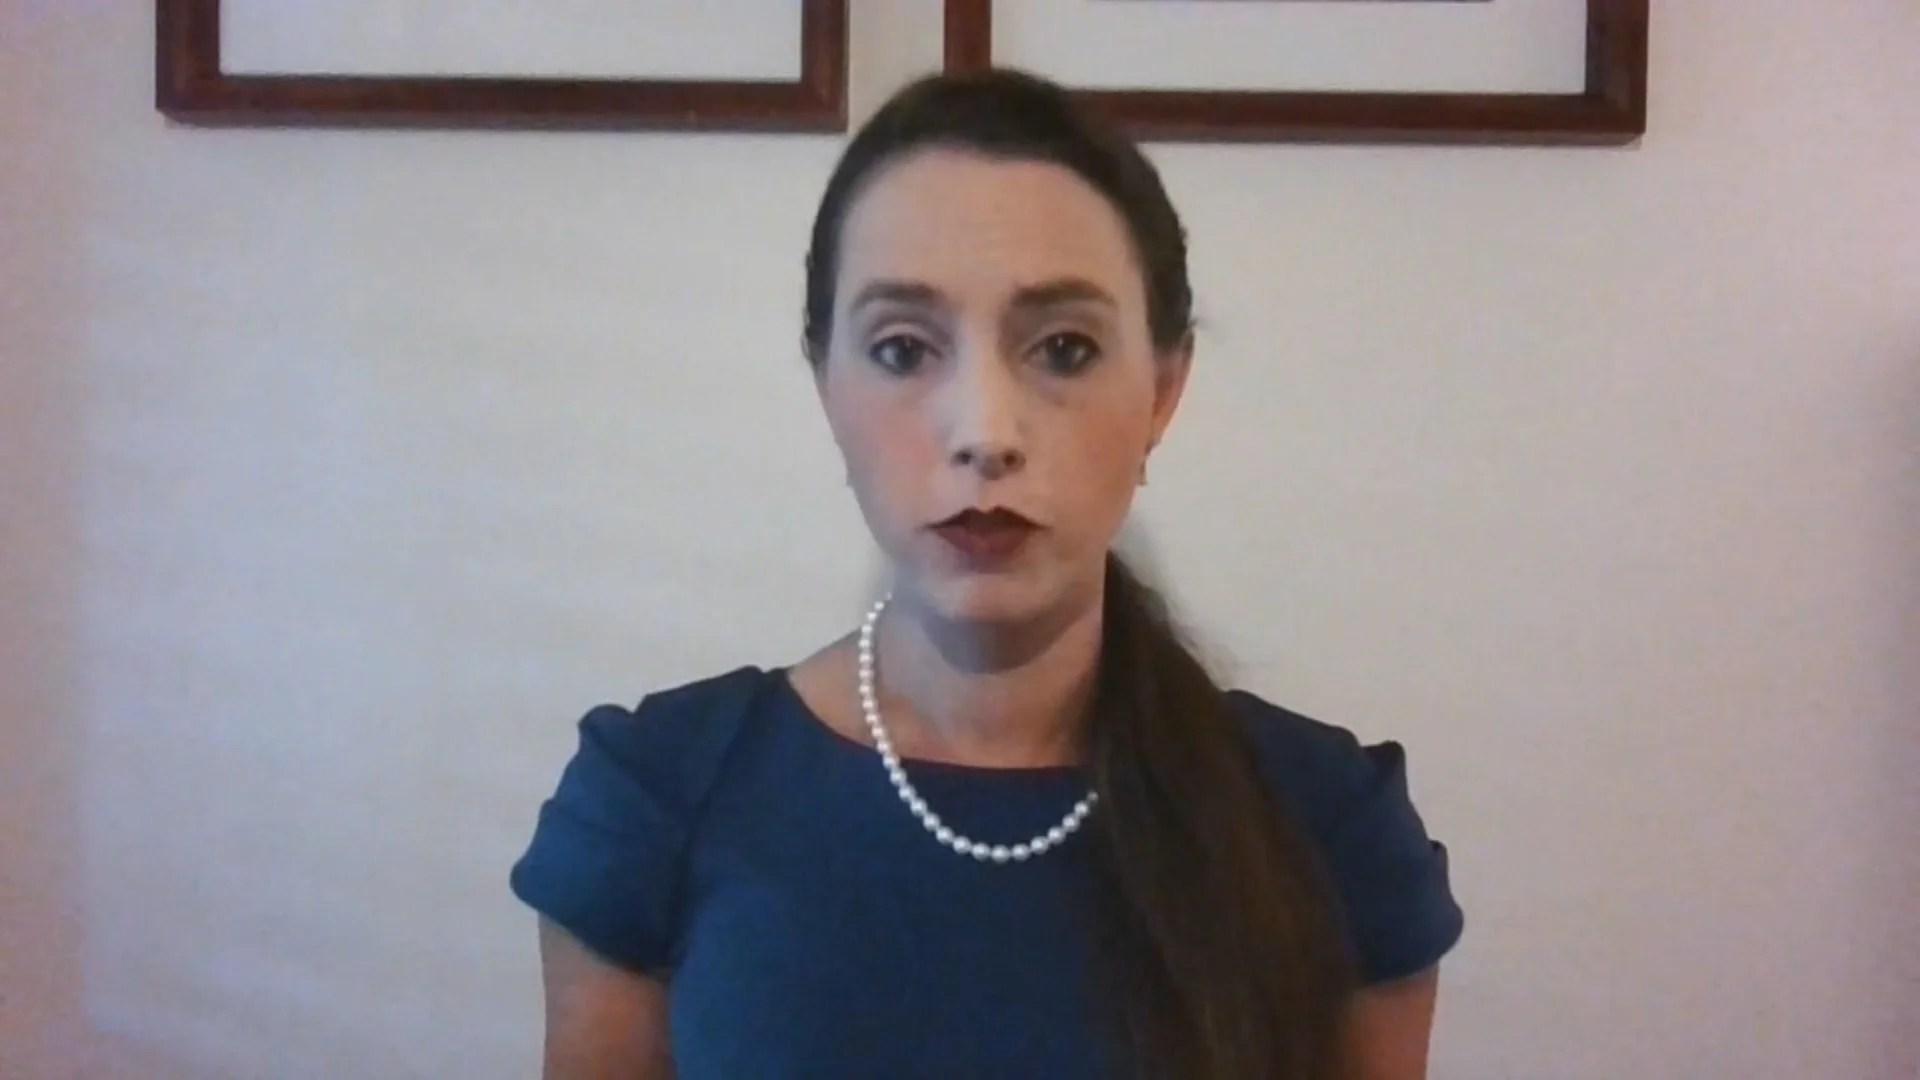 Larry Nassar victim calls for legislative change to hold law enforcement accountable - WISHTV.com